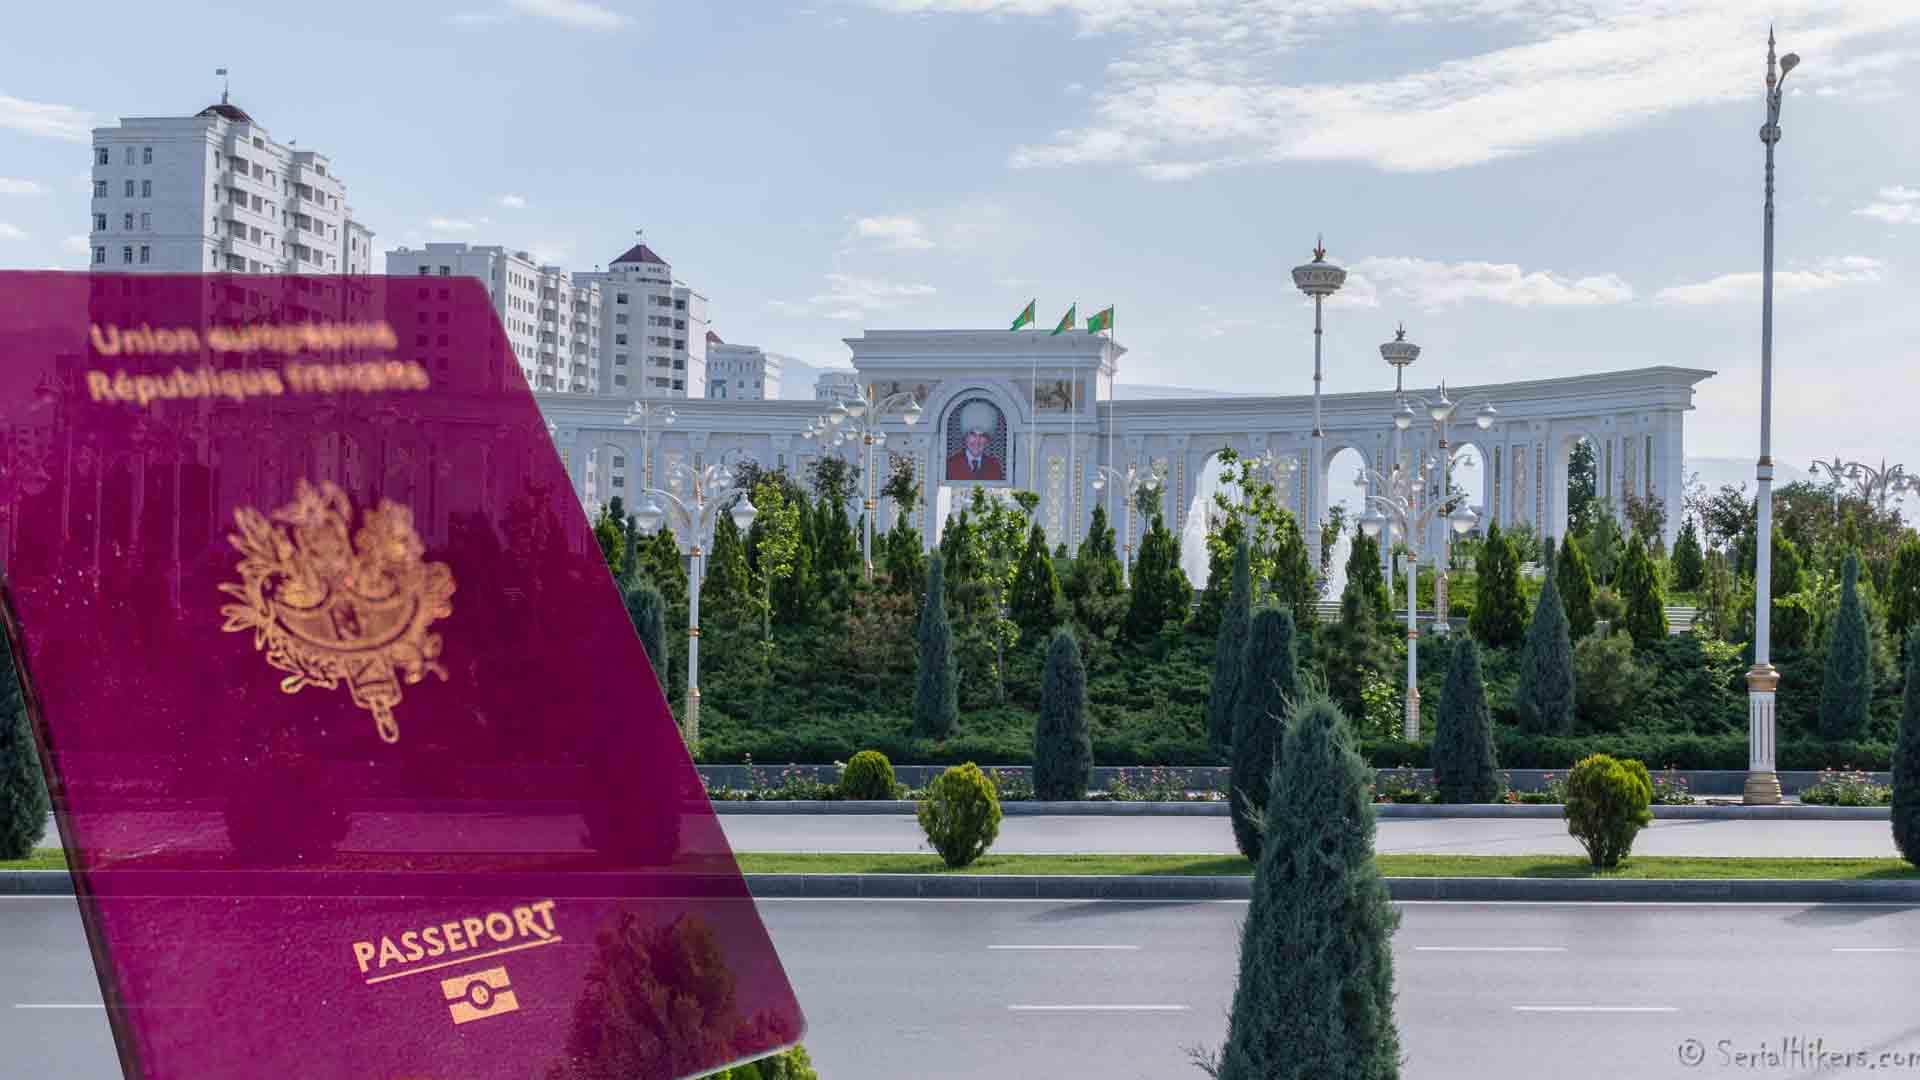 SerialHikers stop autostop world monde tour hitchhiking aventure adventure alternative travel voyage sans avion no fly visa transit turkmenistan teheran iran embassy ambassade